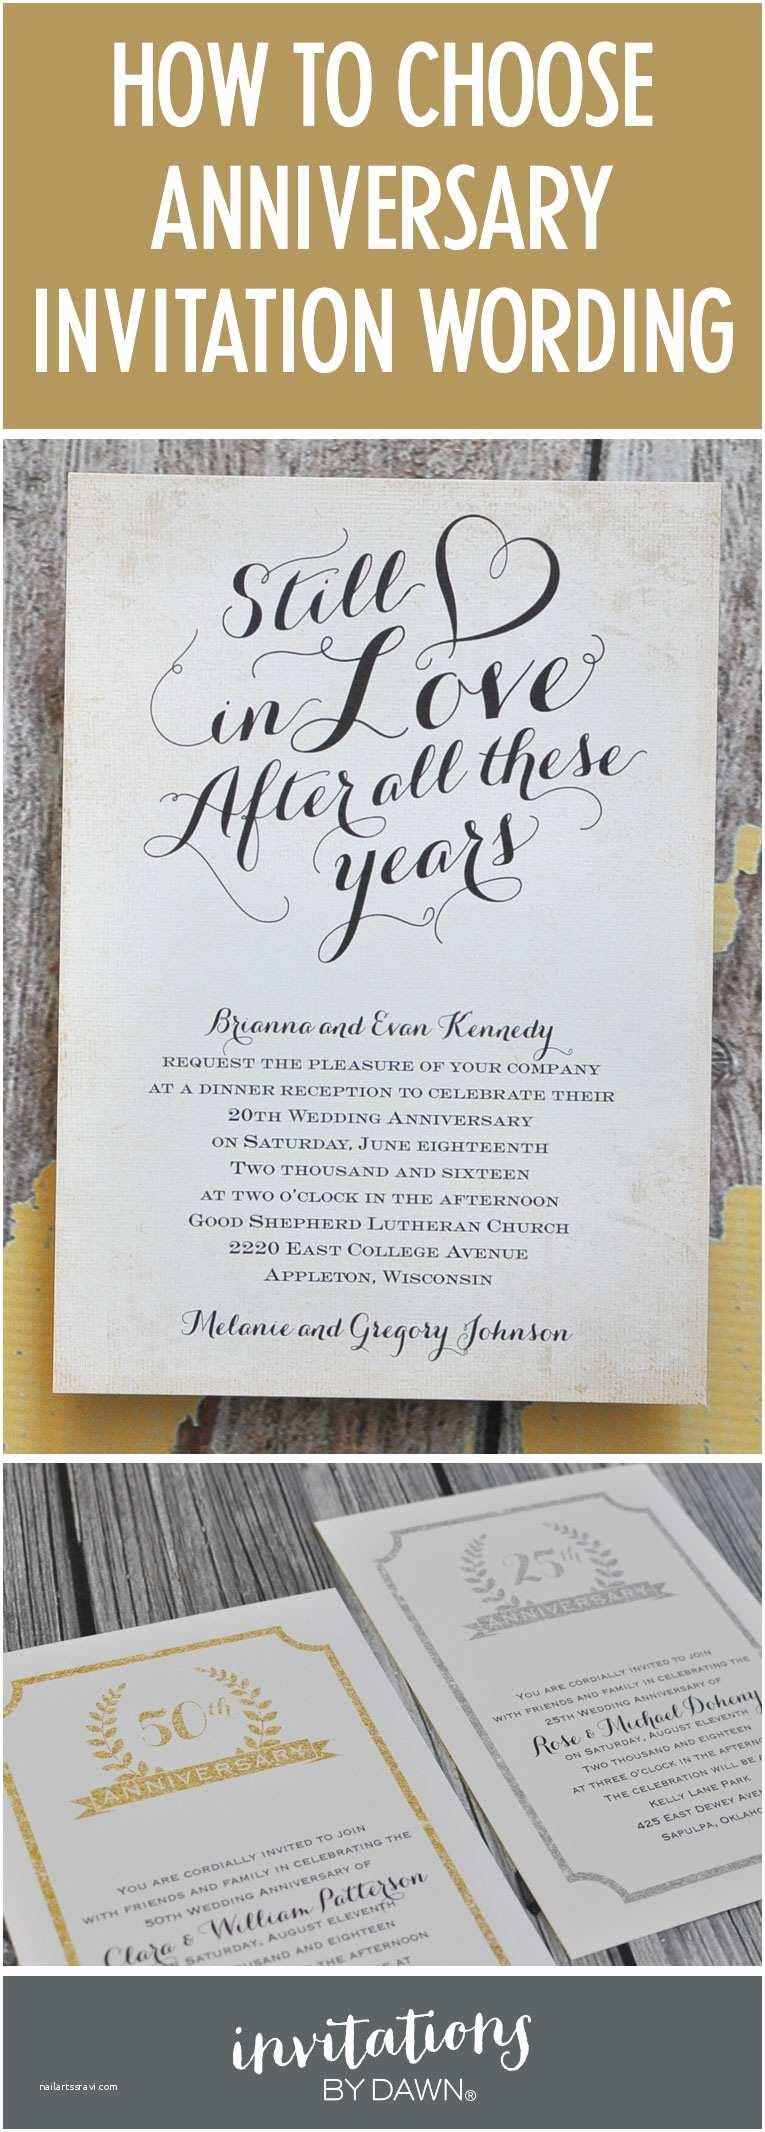 Wedding Anniversary Invitation Wording Finding the Right Wedding Anniversary Invitation Wording